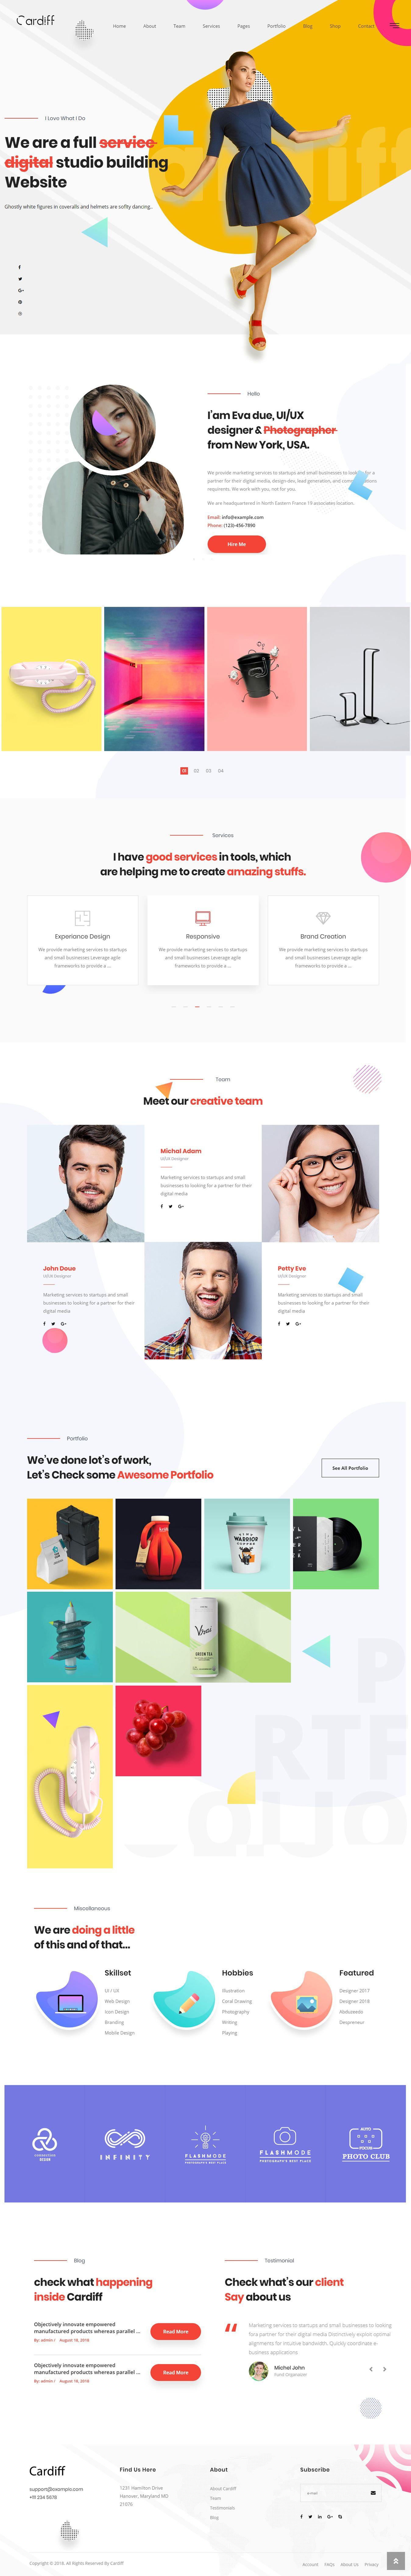 Cardiff Multipurpose Portfolio Theme Wordpress Theme Portfolio Portfolio Web Design Wordpress Web Design